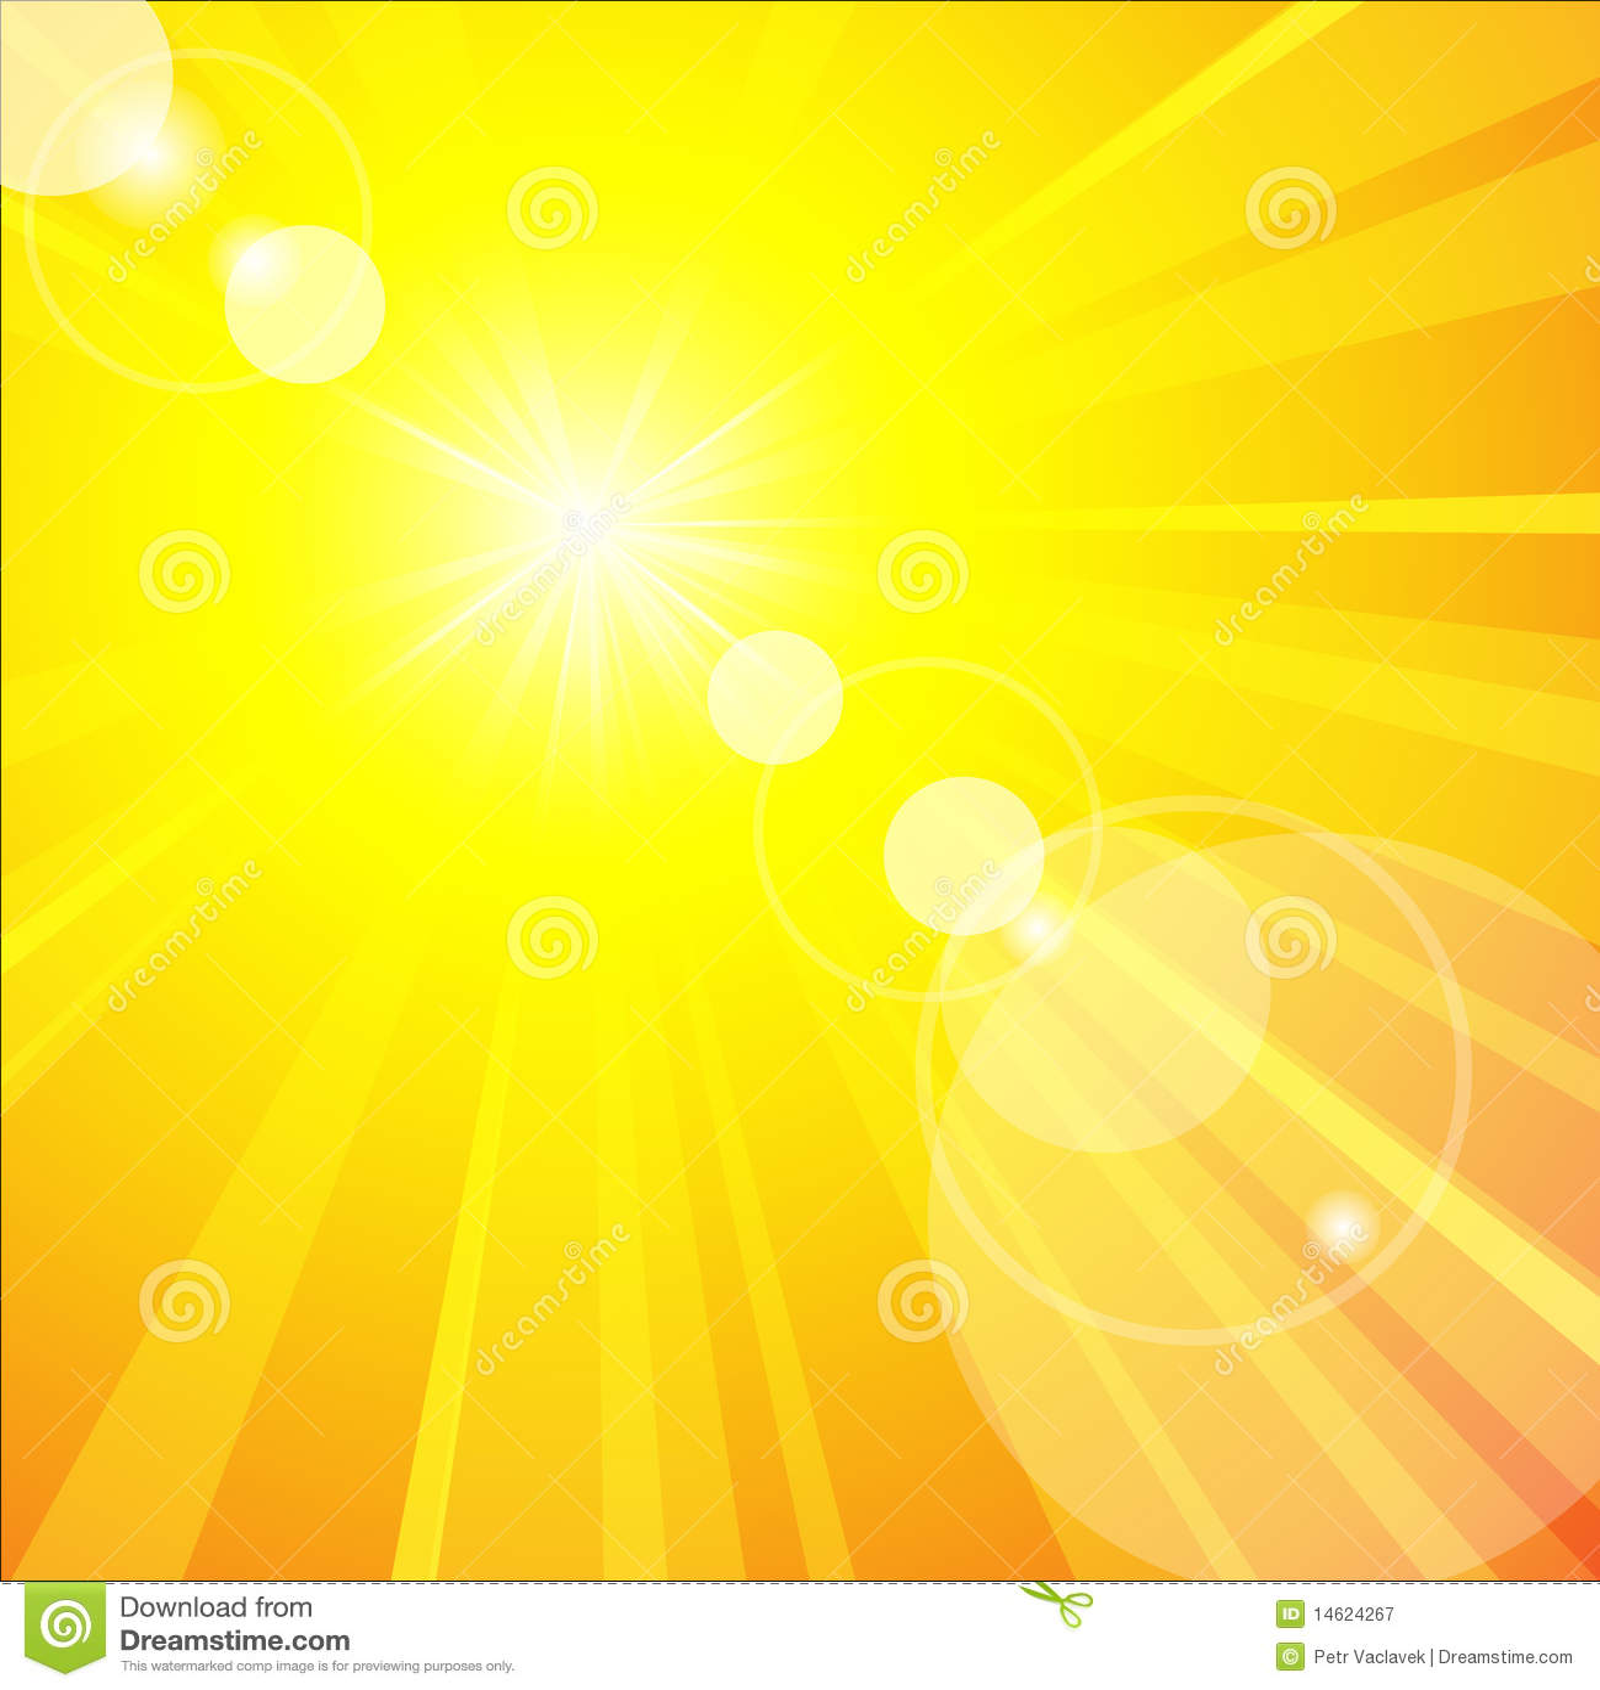 Heliopsis Summer Sun: Vibrant Yellow All Summer